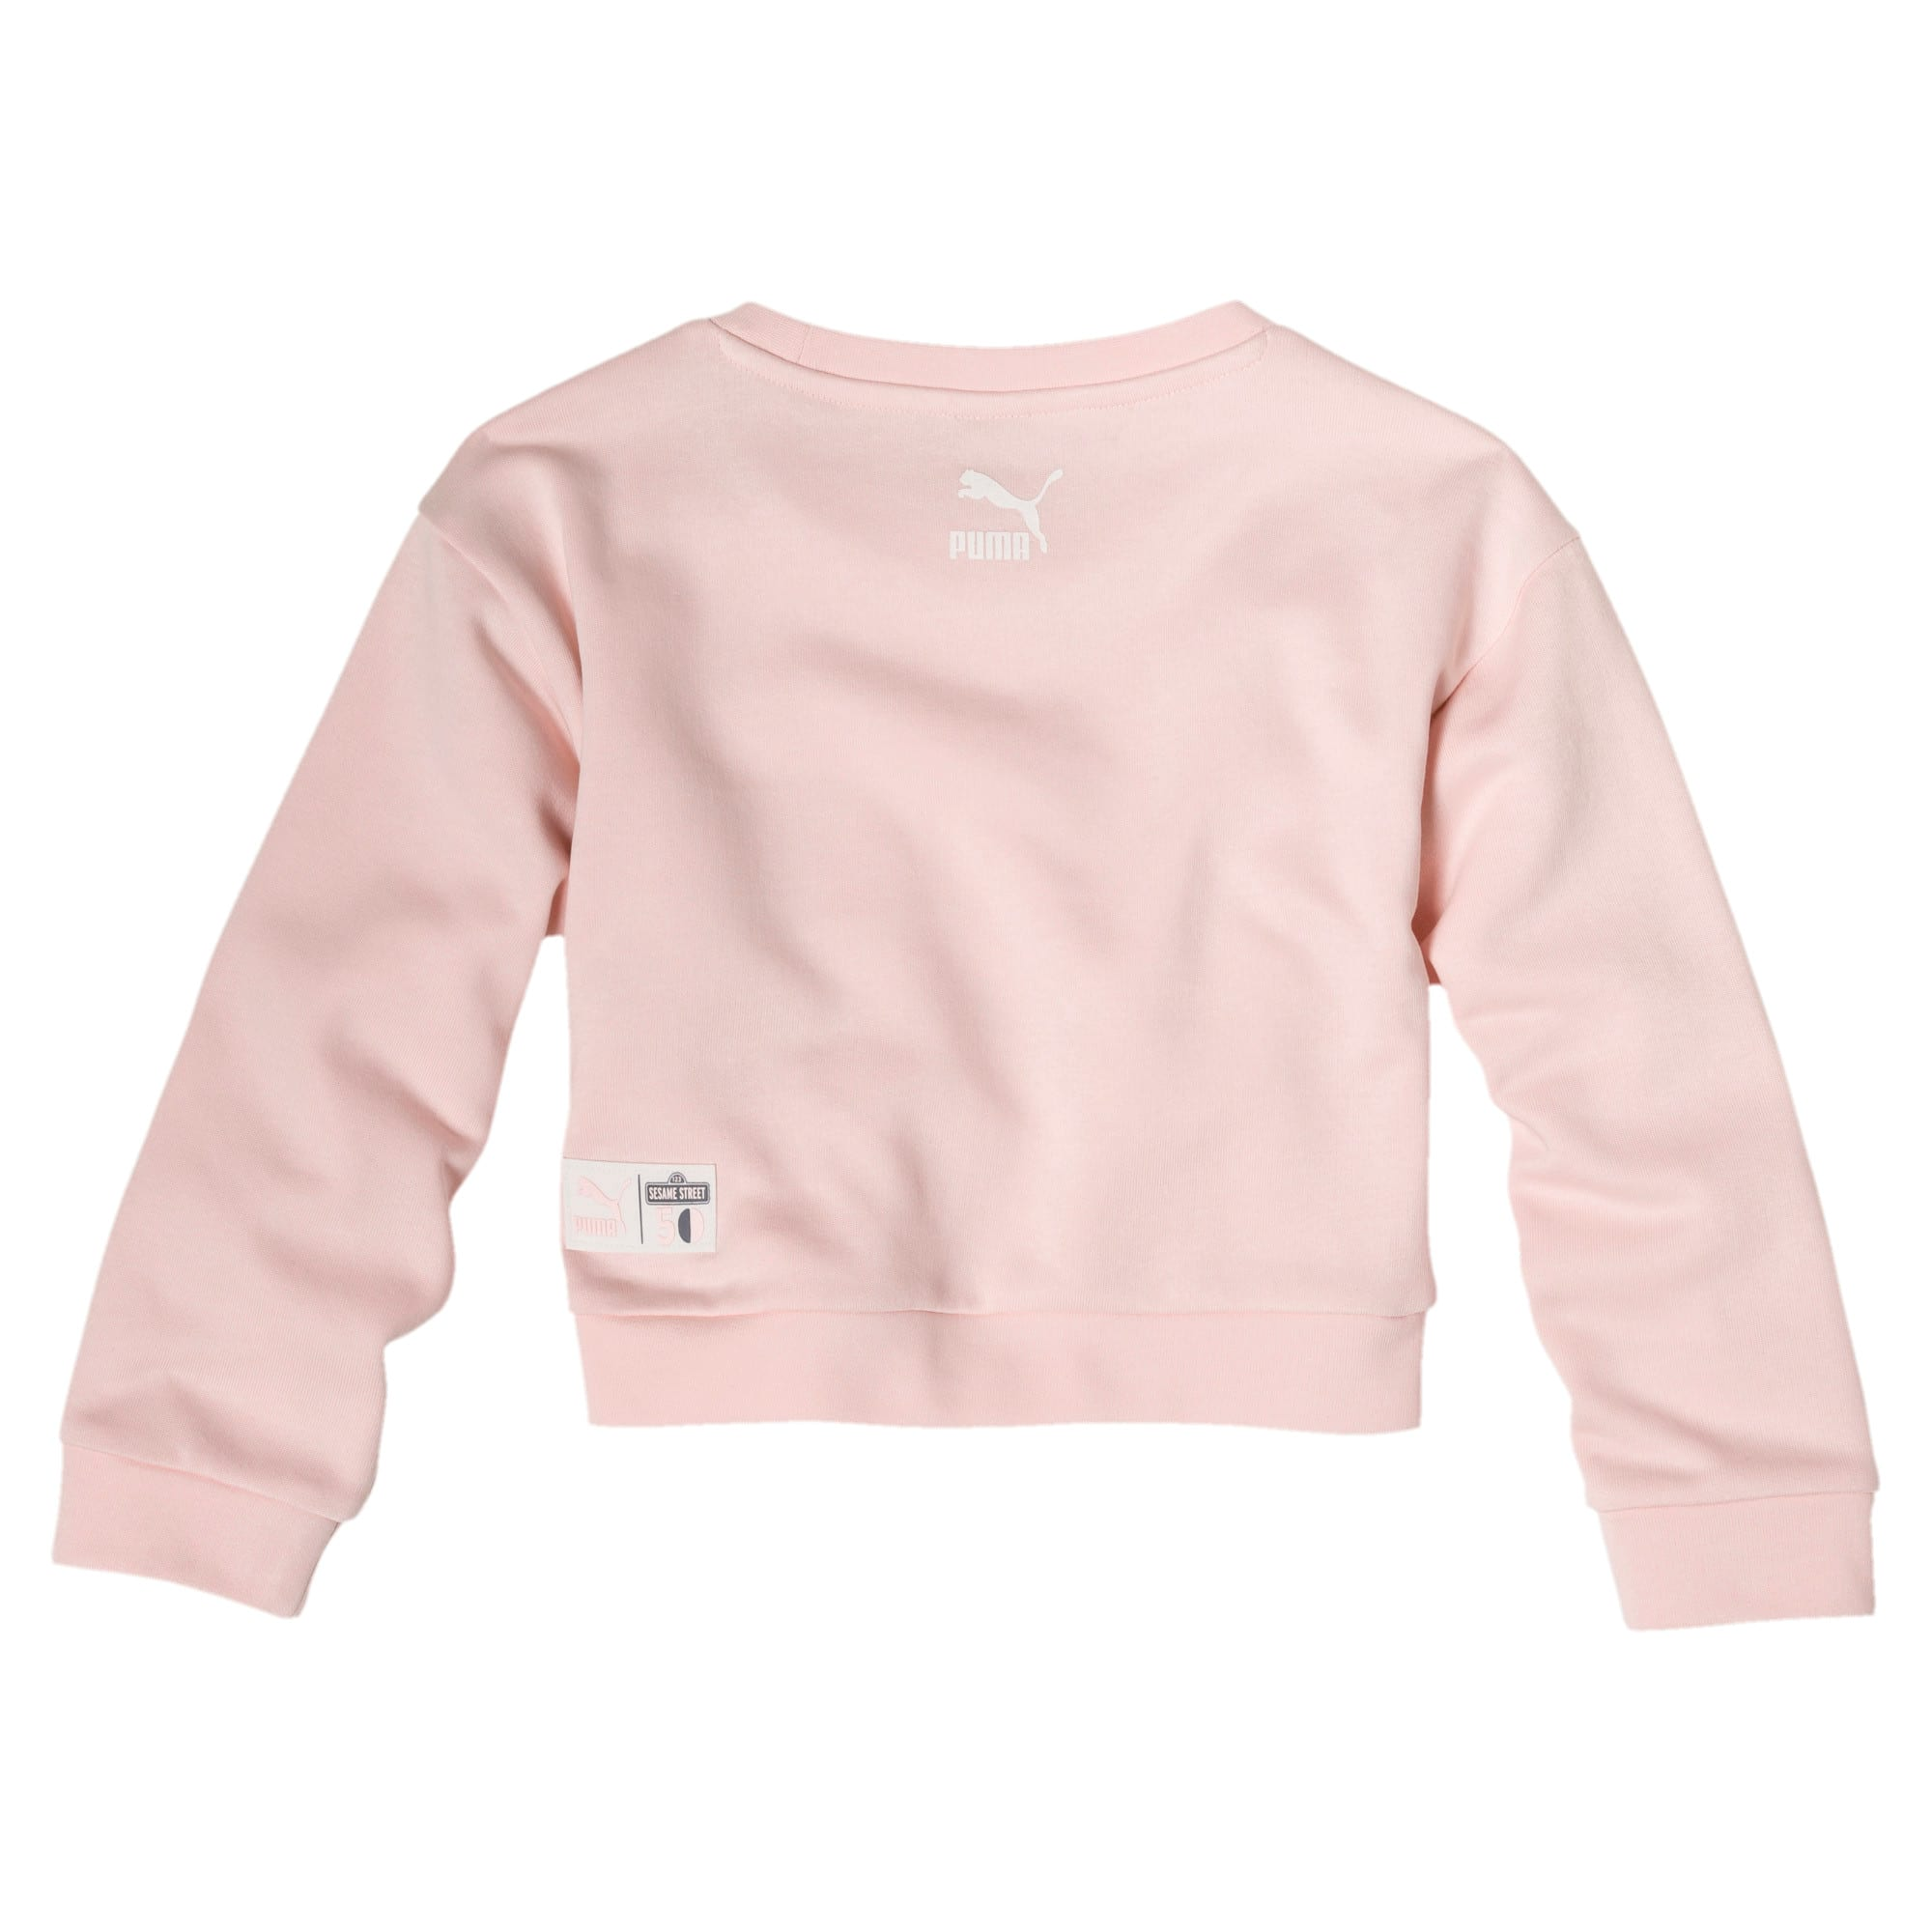 Thumbnail 2 of PUMA x SESAME STREET Girl's Crewneck Sweatshirt, Veiled Rose, medium